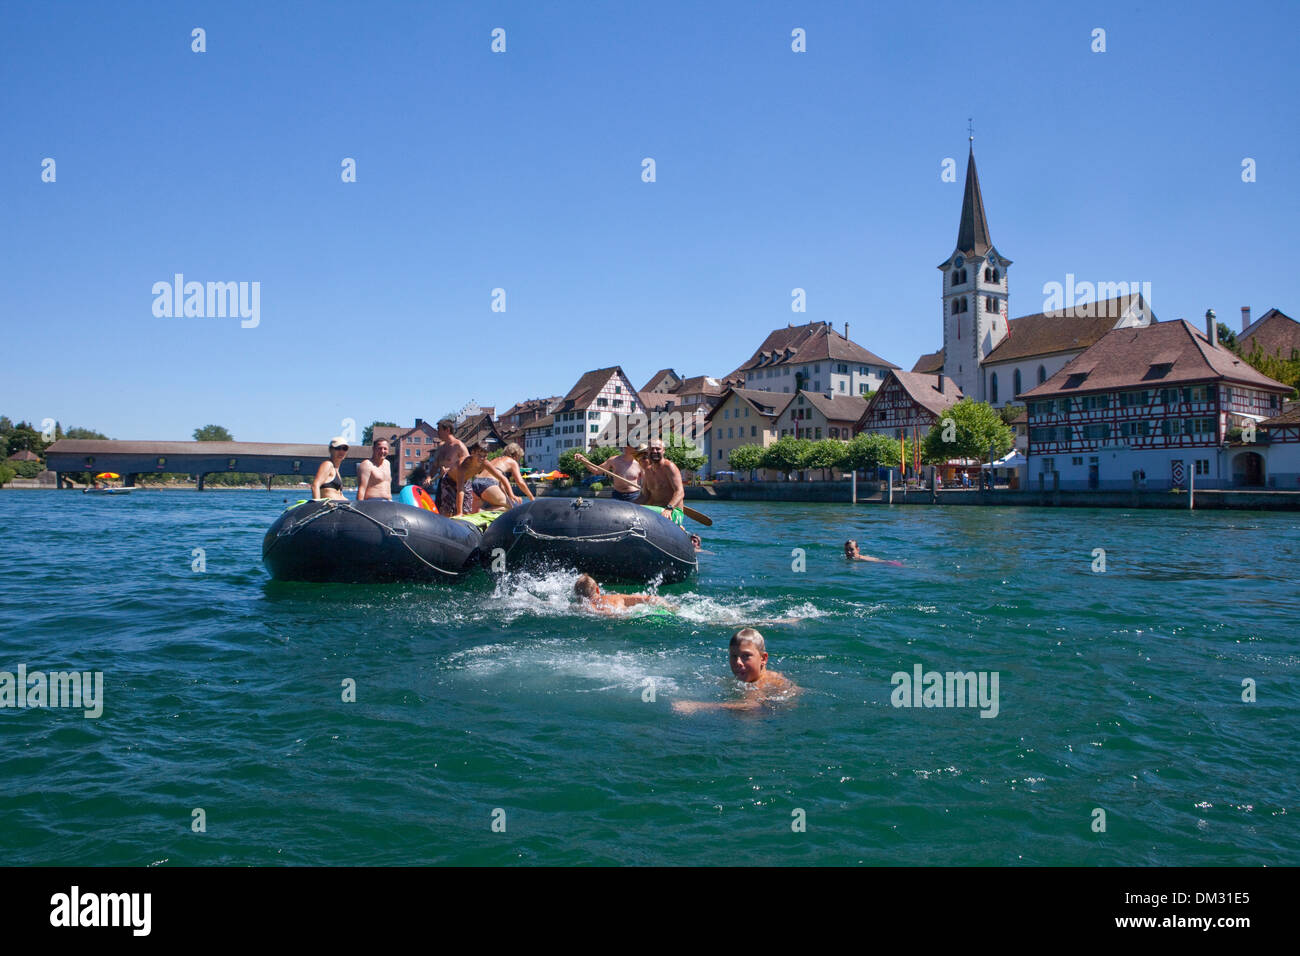 Switzerland Europe ship boat ships boats water sport boat rubber dinghy life raft canton TG Thurgau group Rhine Diessenhofen - Stock Image